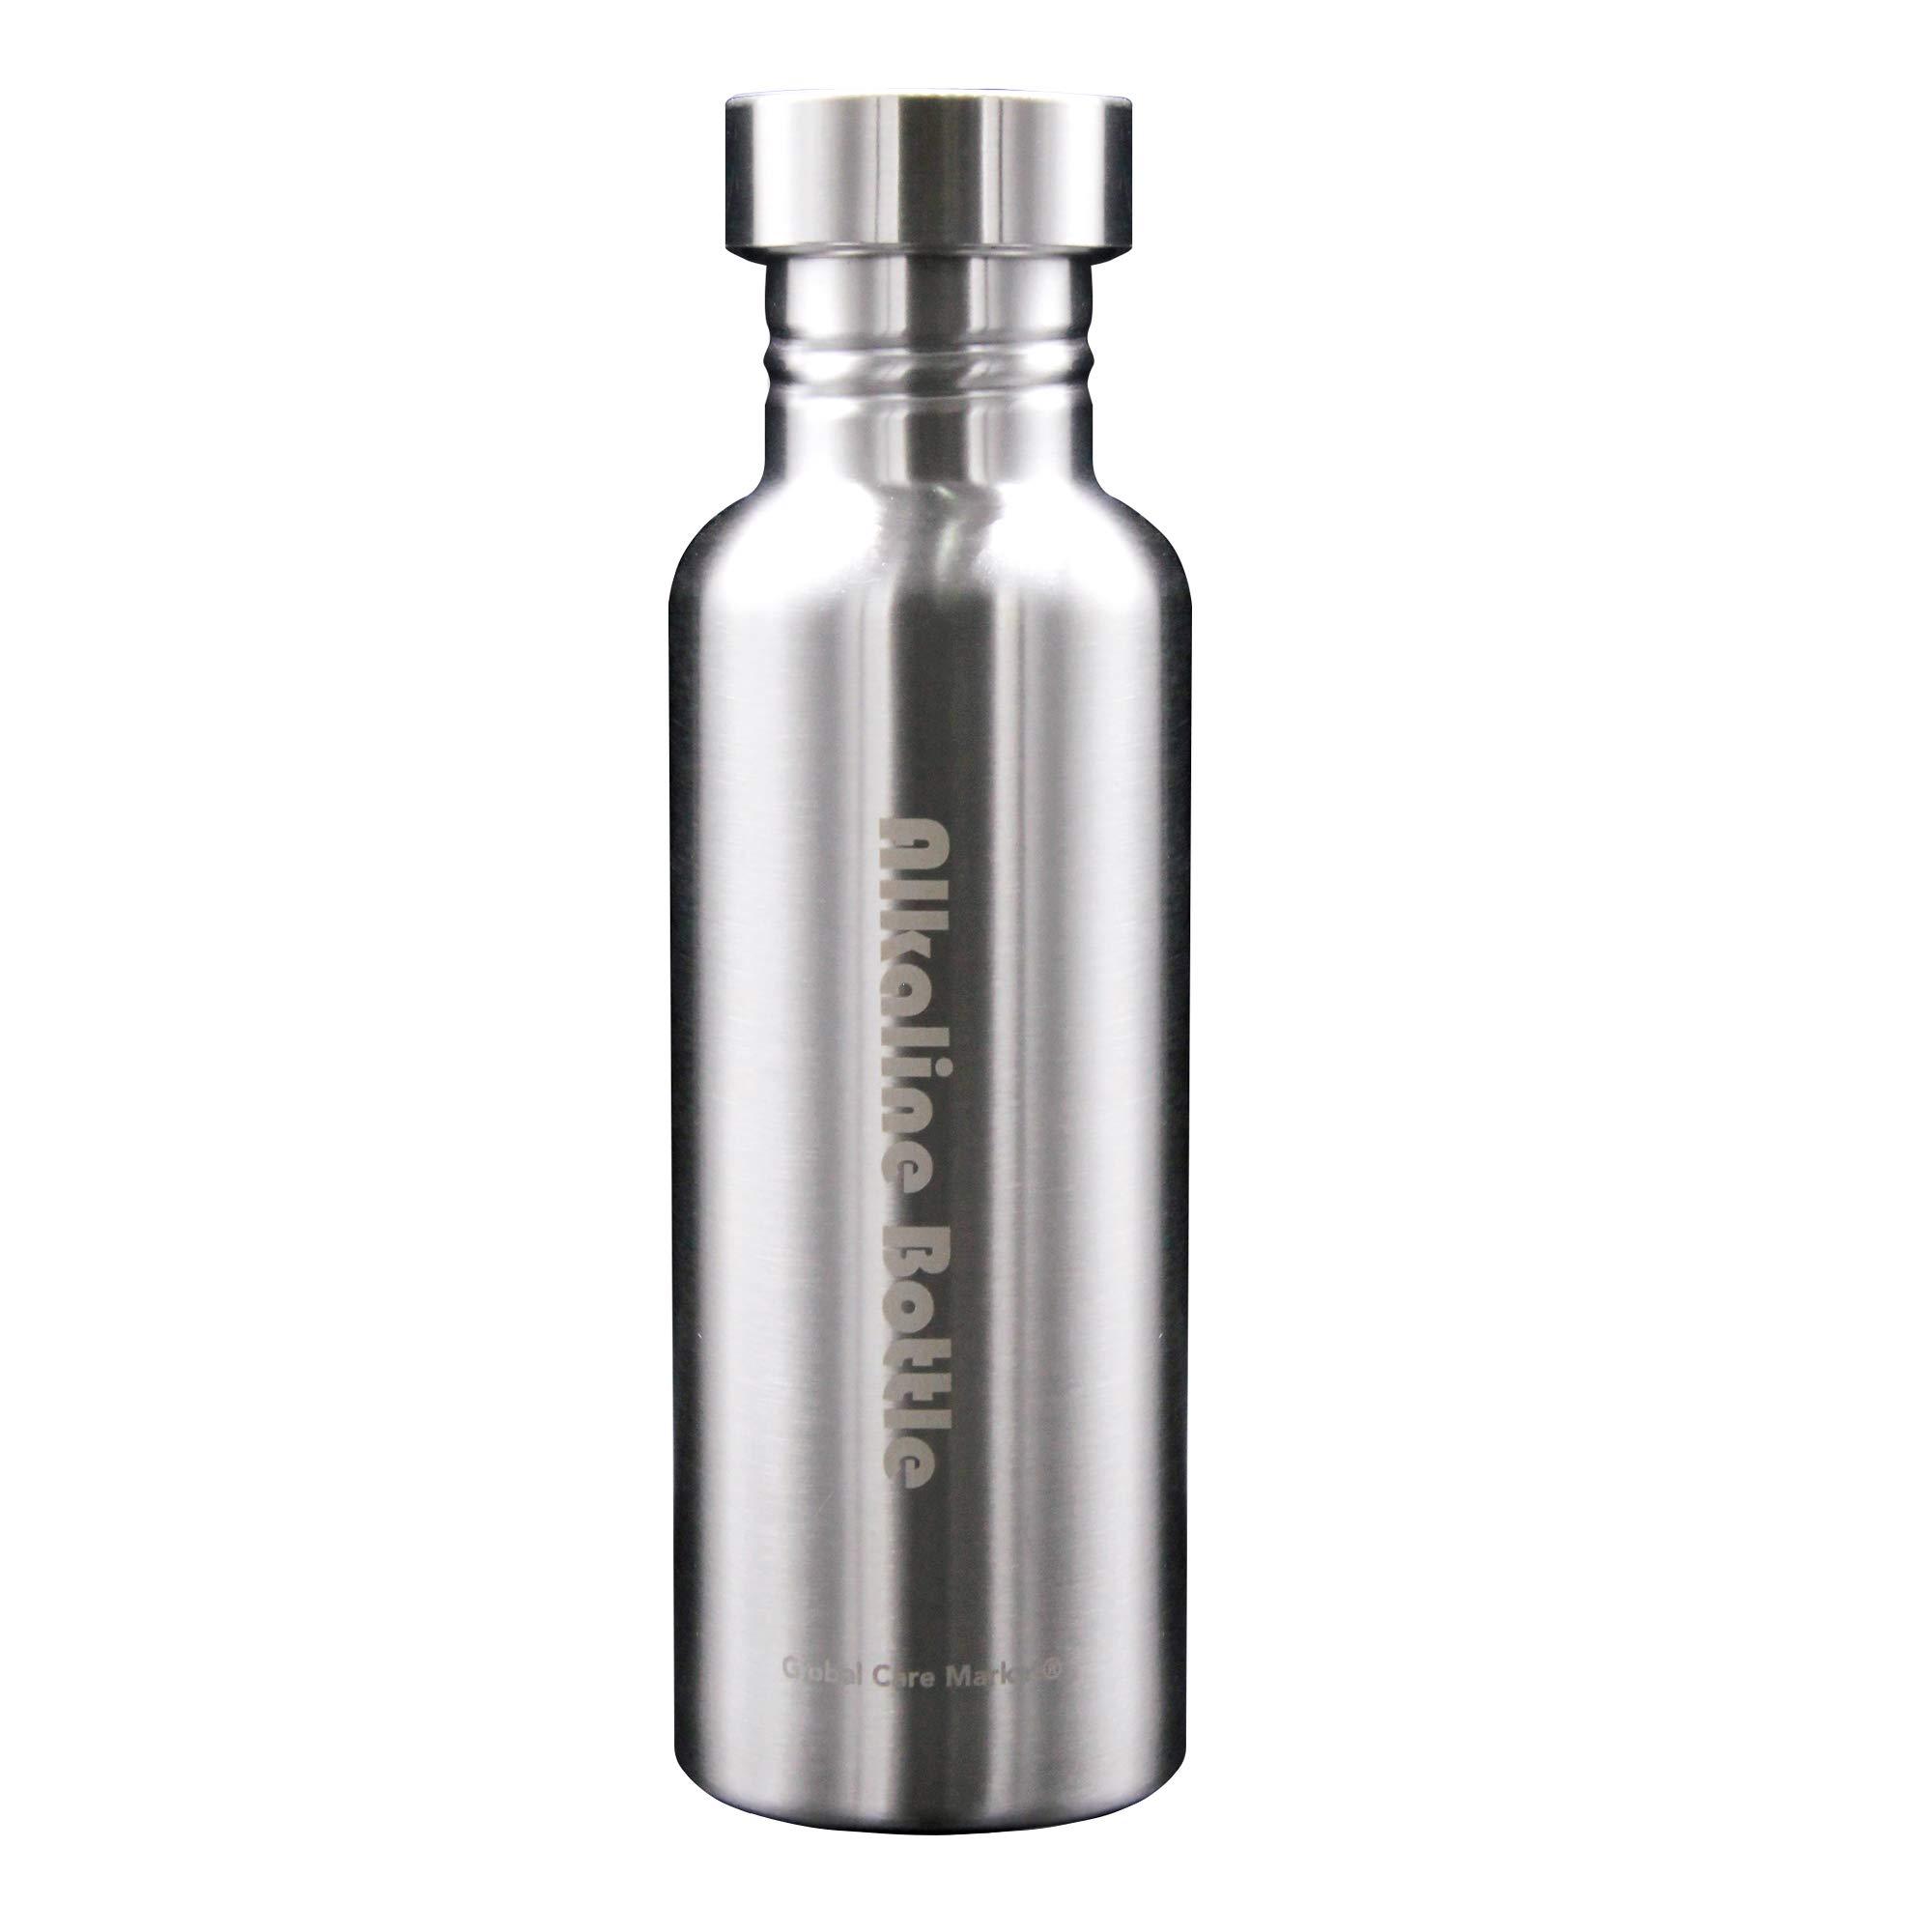 Global Care Market New Alkaline Water Bottle Big 650ml Capacity Nano Energy Water Flask Stainless Steel Alkaline Water Filter Bottle to Naturally Enhance Drinking Water